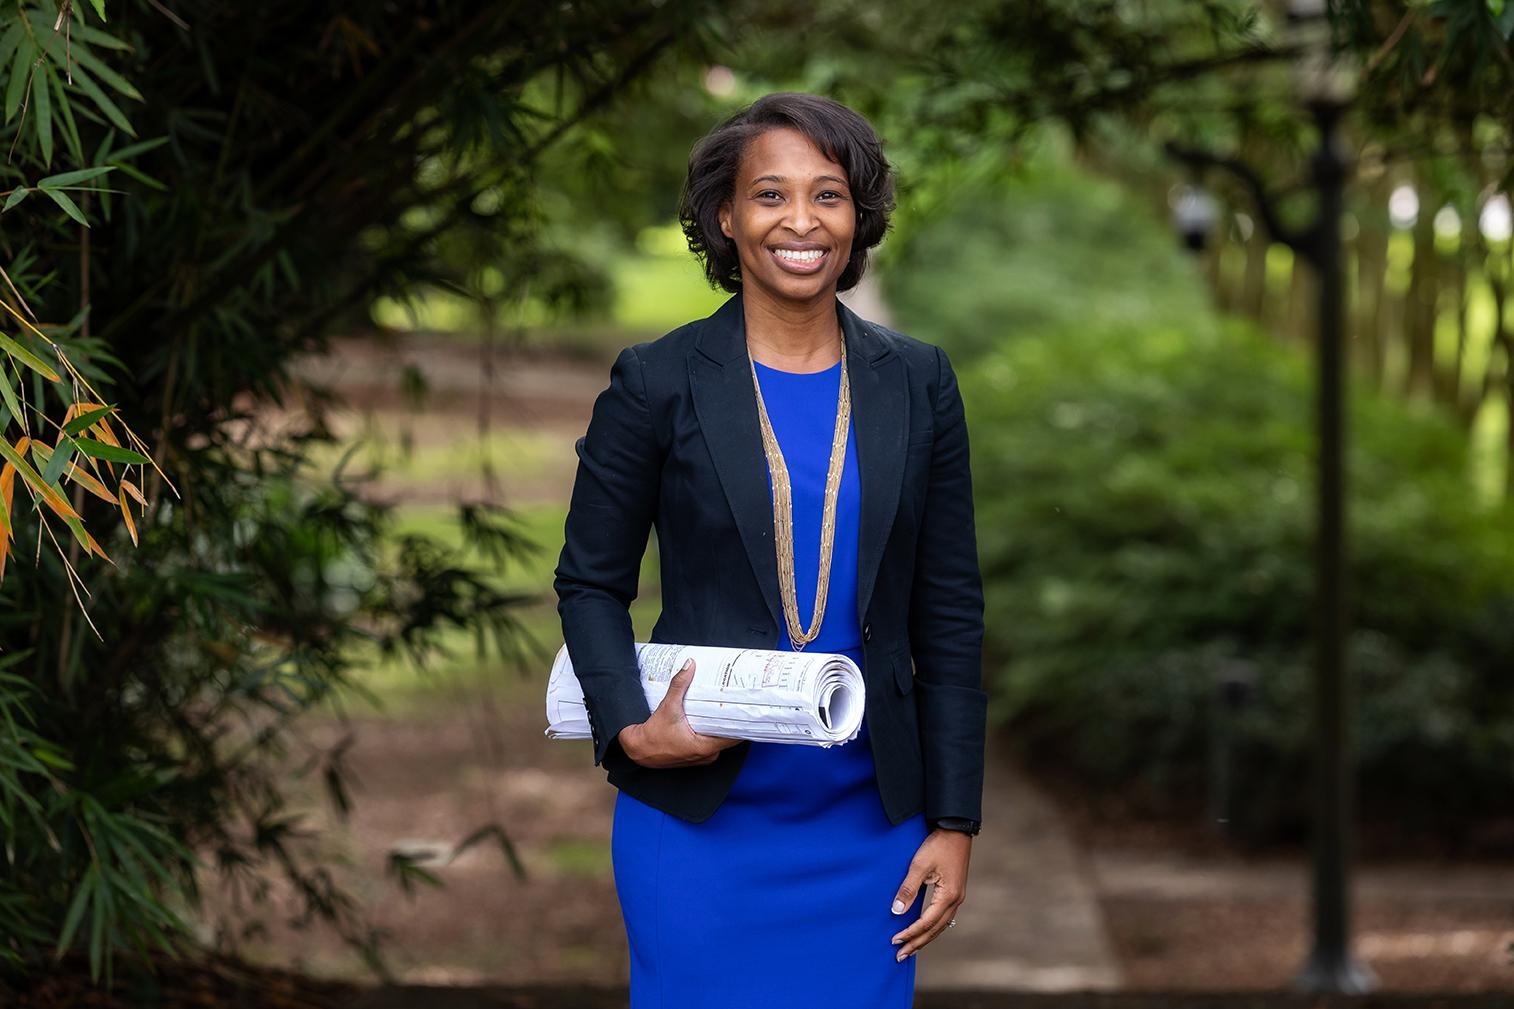 2020 Influential Women in Business